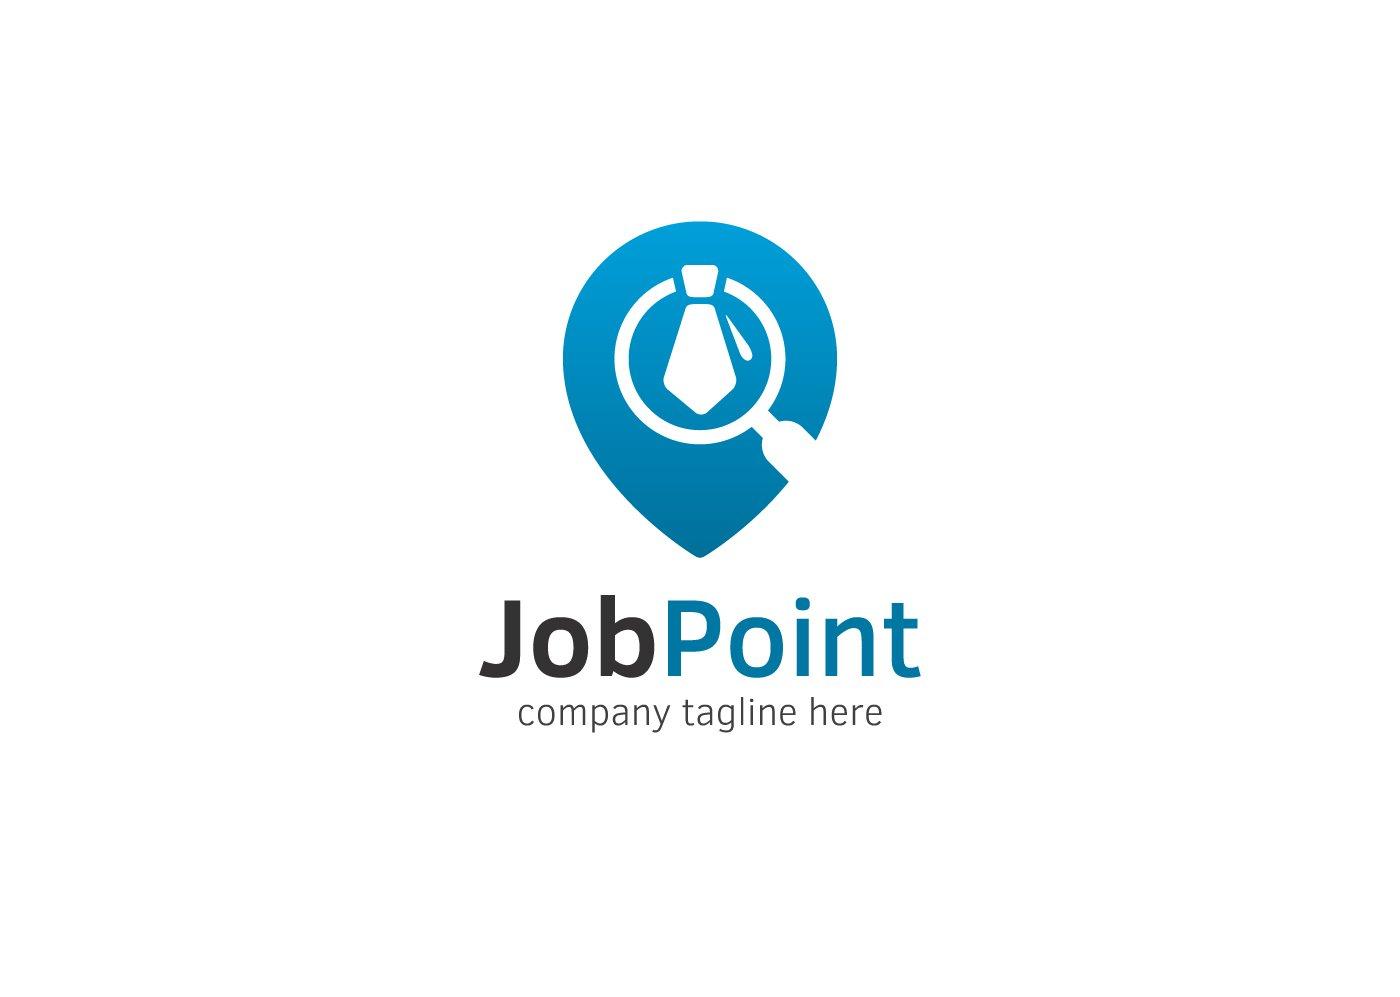 job point logo logo templates creative market. Black Bedroom Furniture Sets. Home Design Ideas